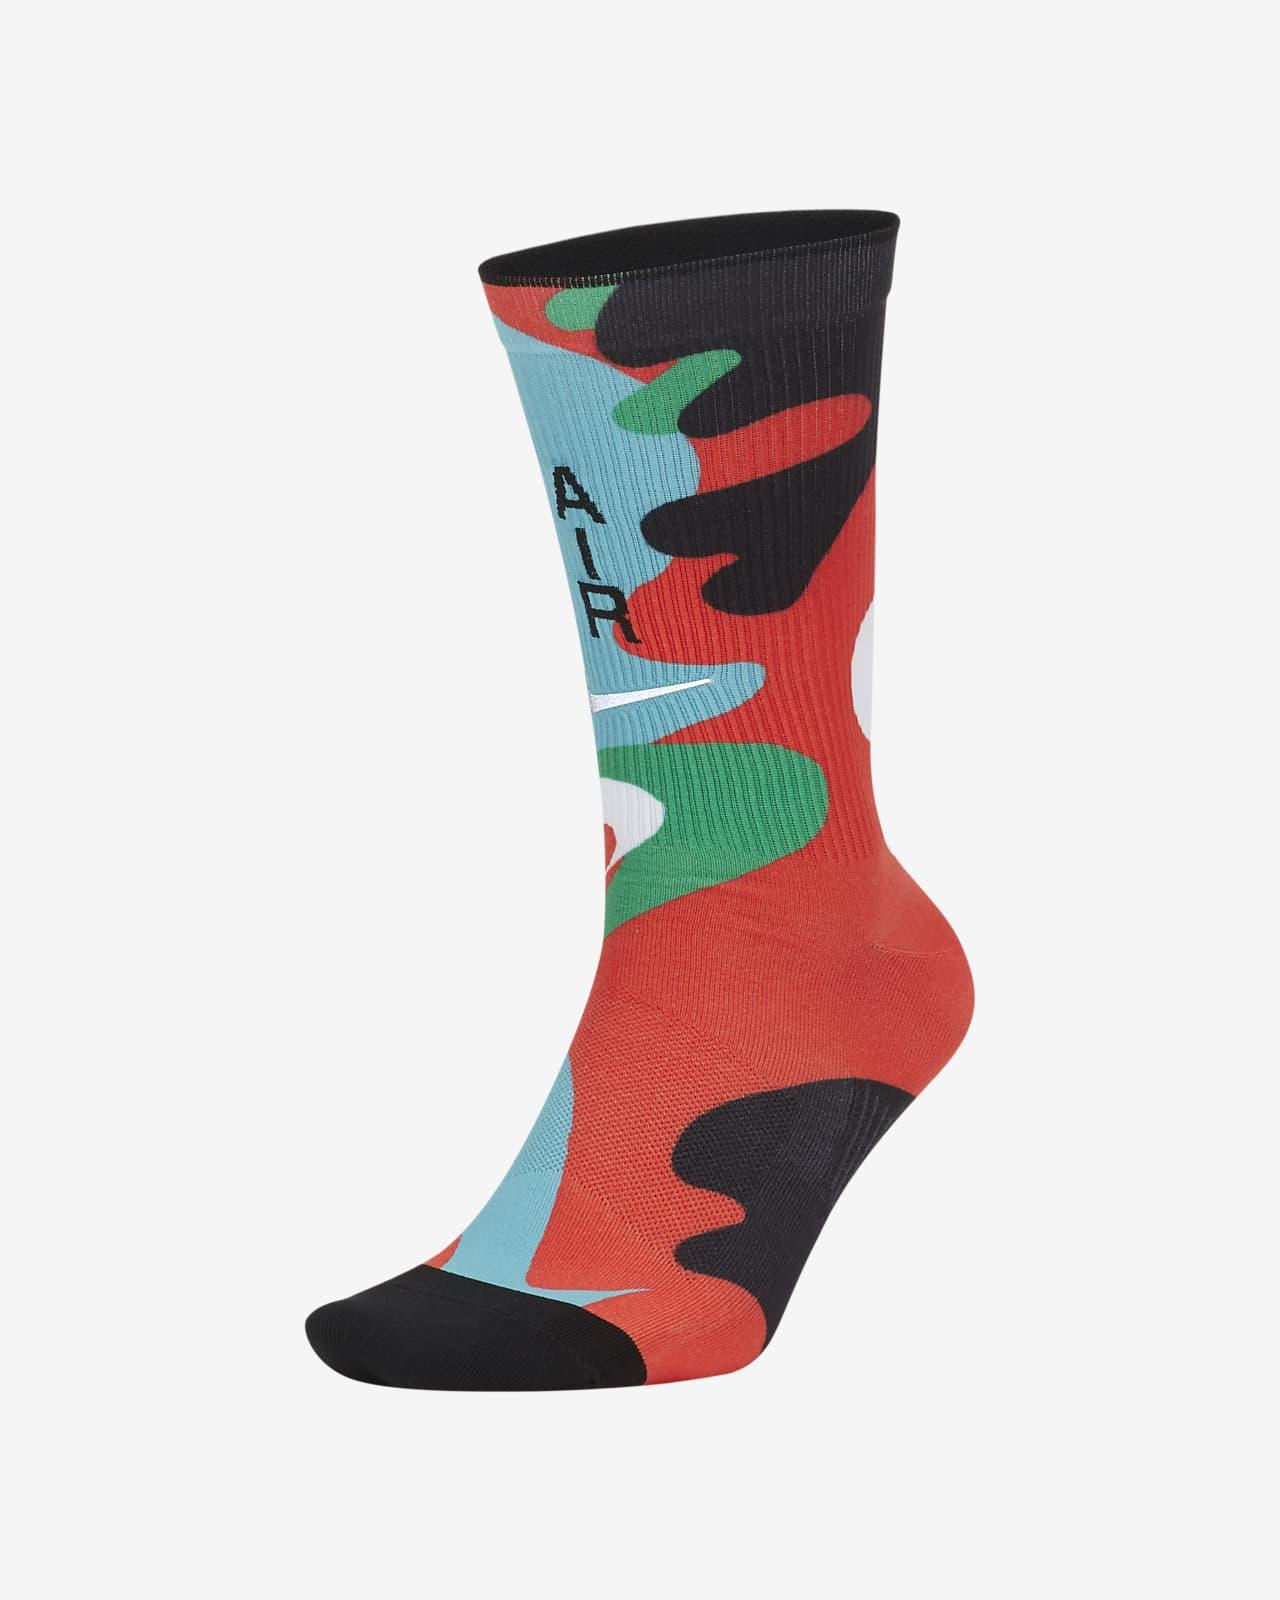 Nike Spark Lightweight A.I.R. Running Socks